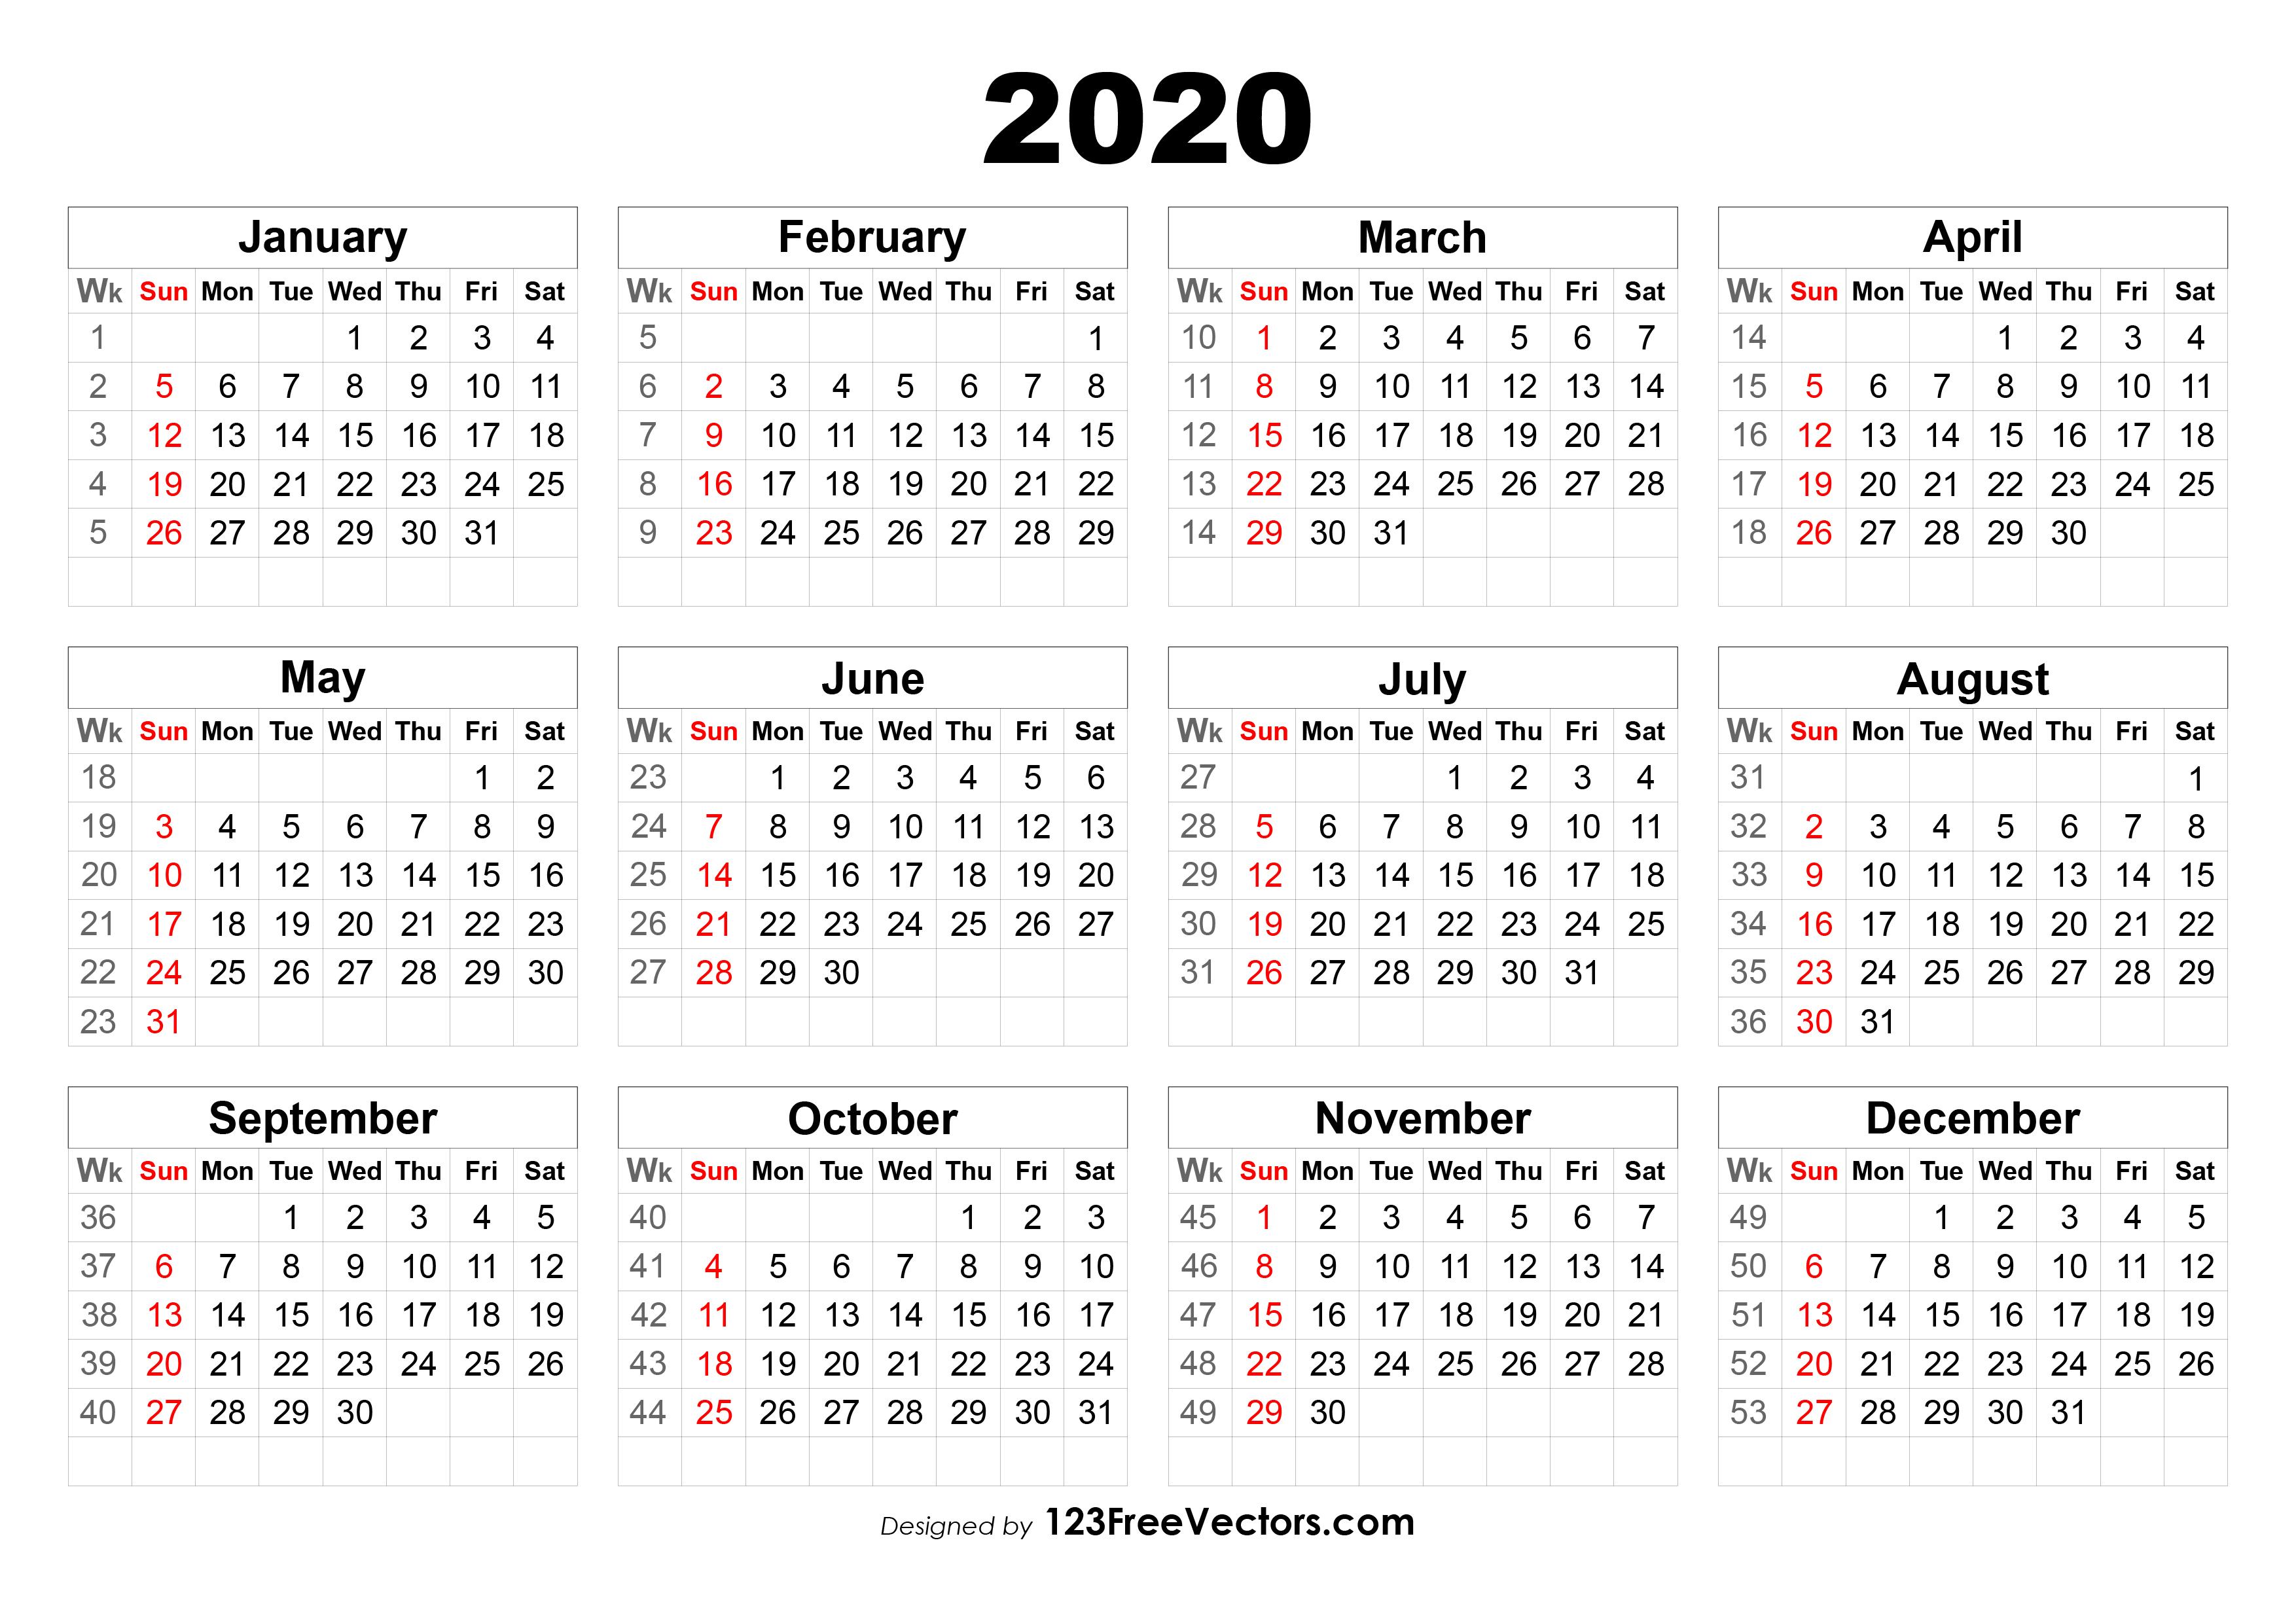 2020 Weekly Calendar Printable - Wpa.wpart.co